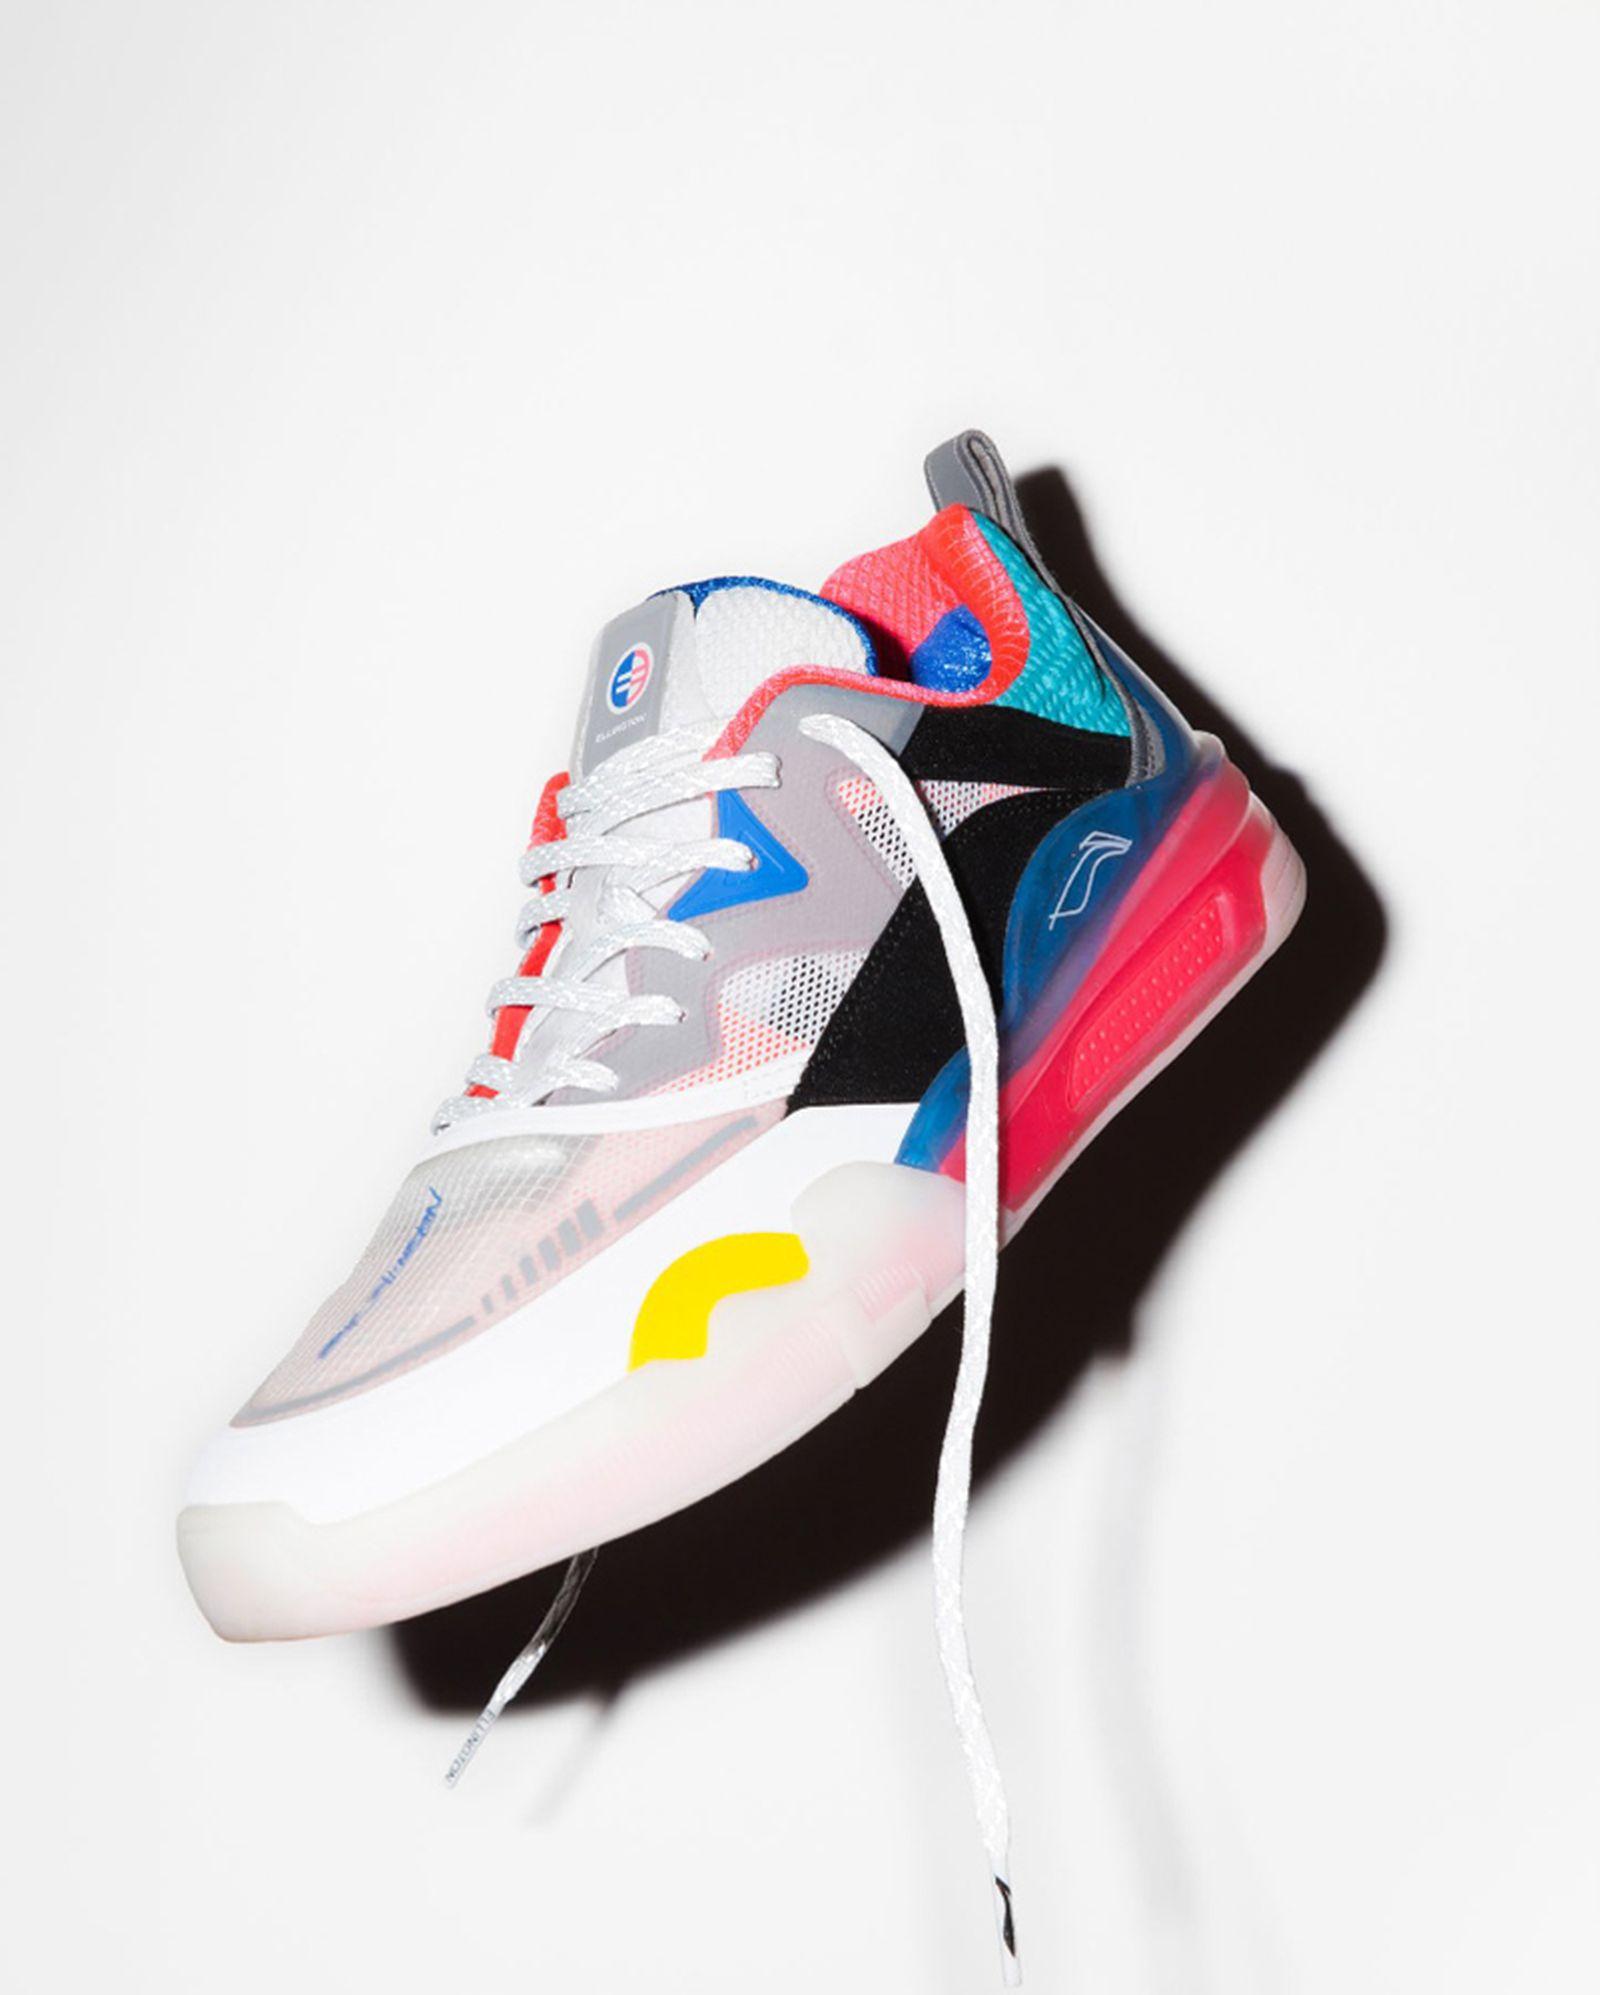 li-ning-skate-collection-erik-ellington-release-date-price-1-01